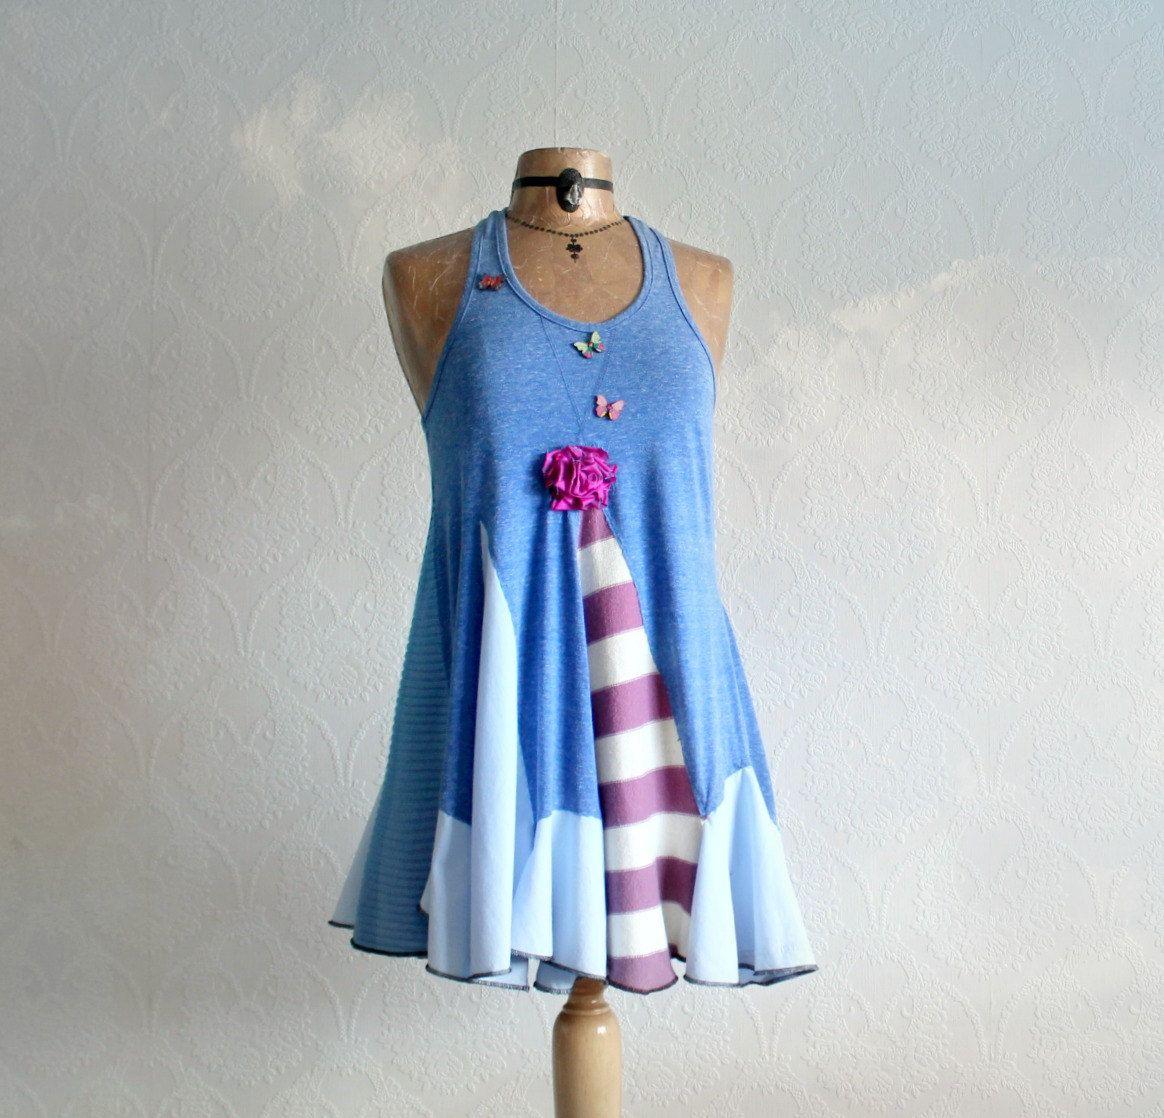 Blue Lagenlook Top Summer Boho Shirt Fit by BrokenGhostClothing